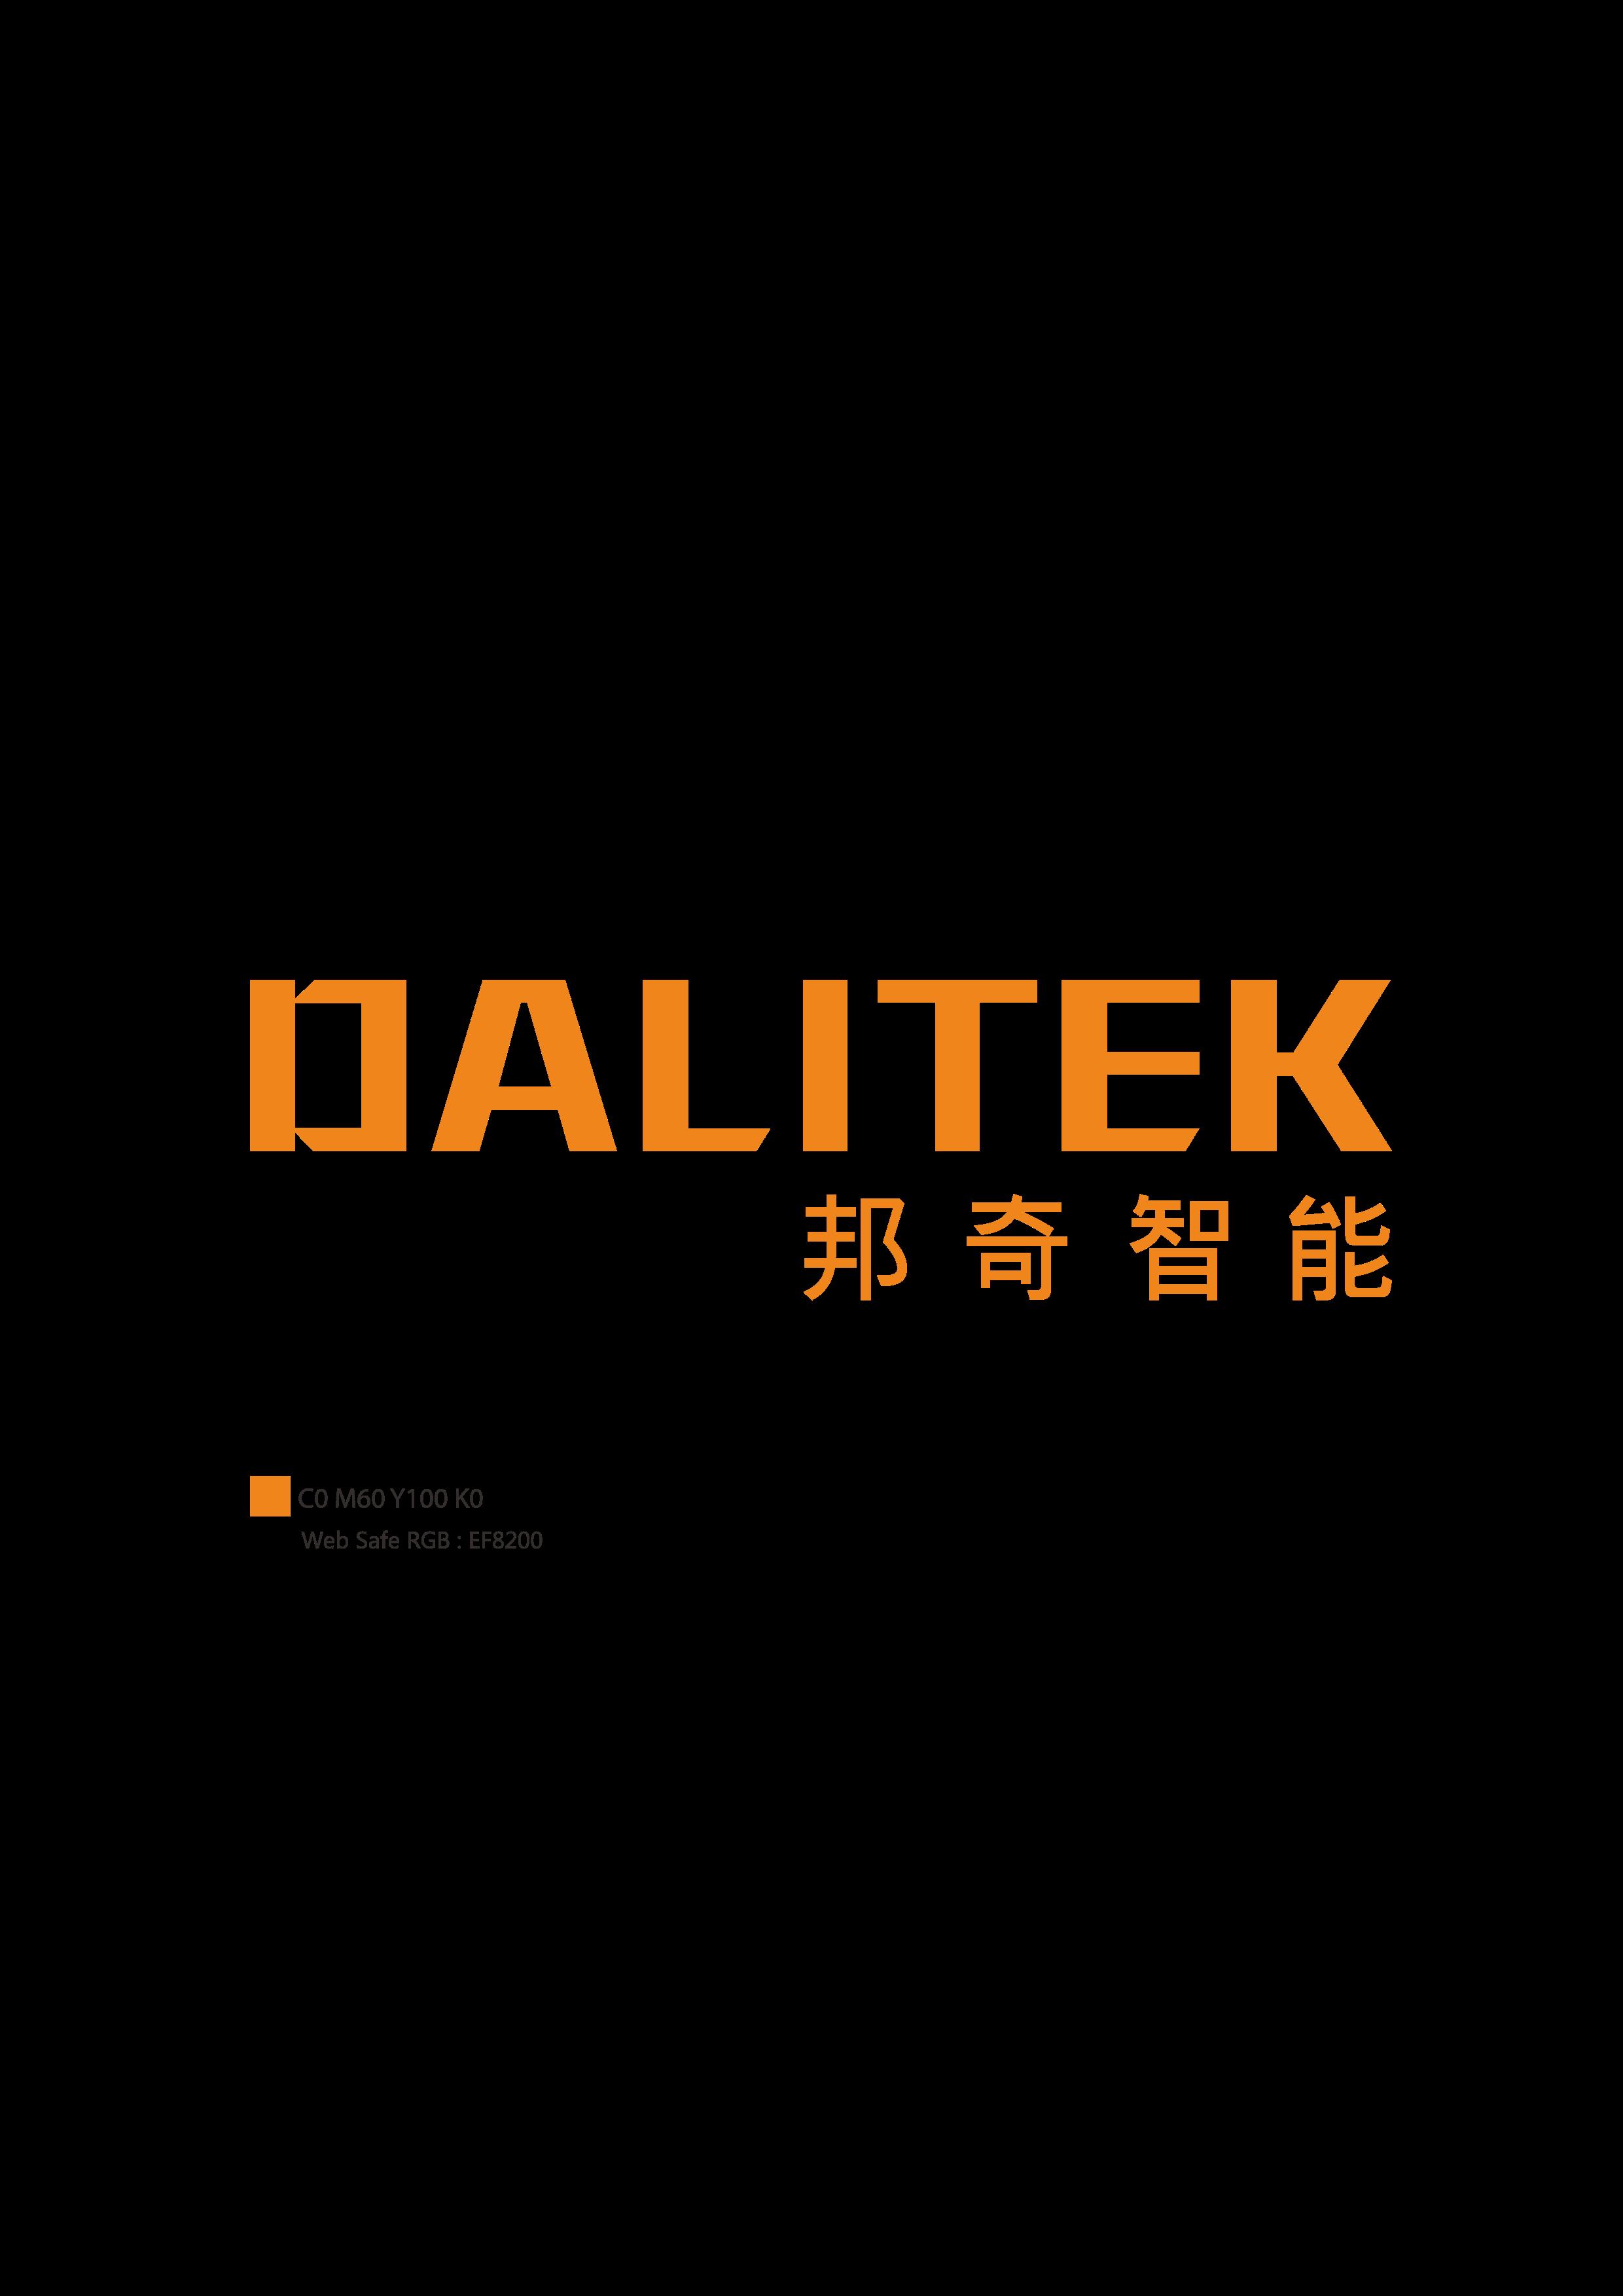 DALITEK Intelligent Technology (Shanghai) Inc.